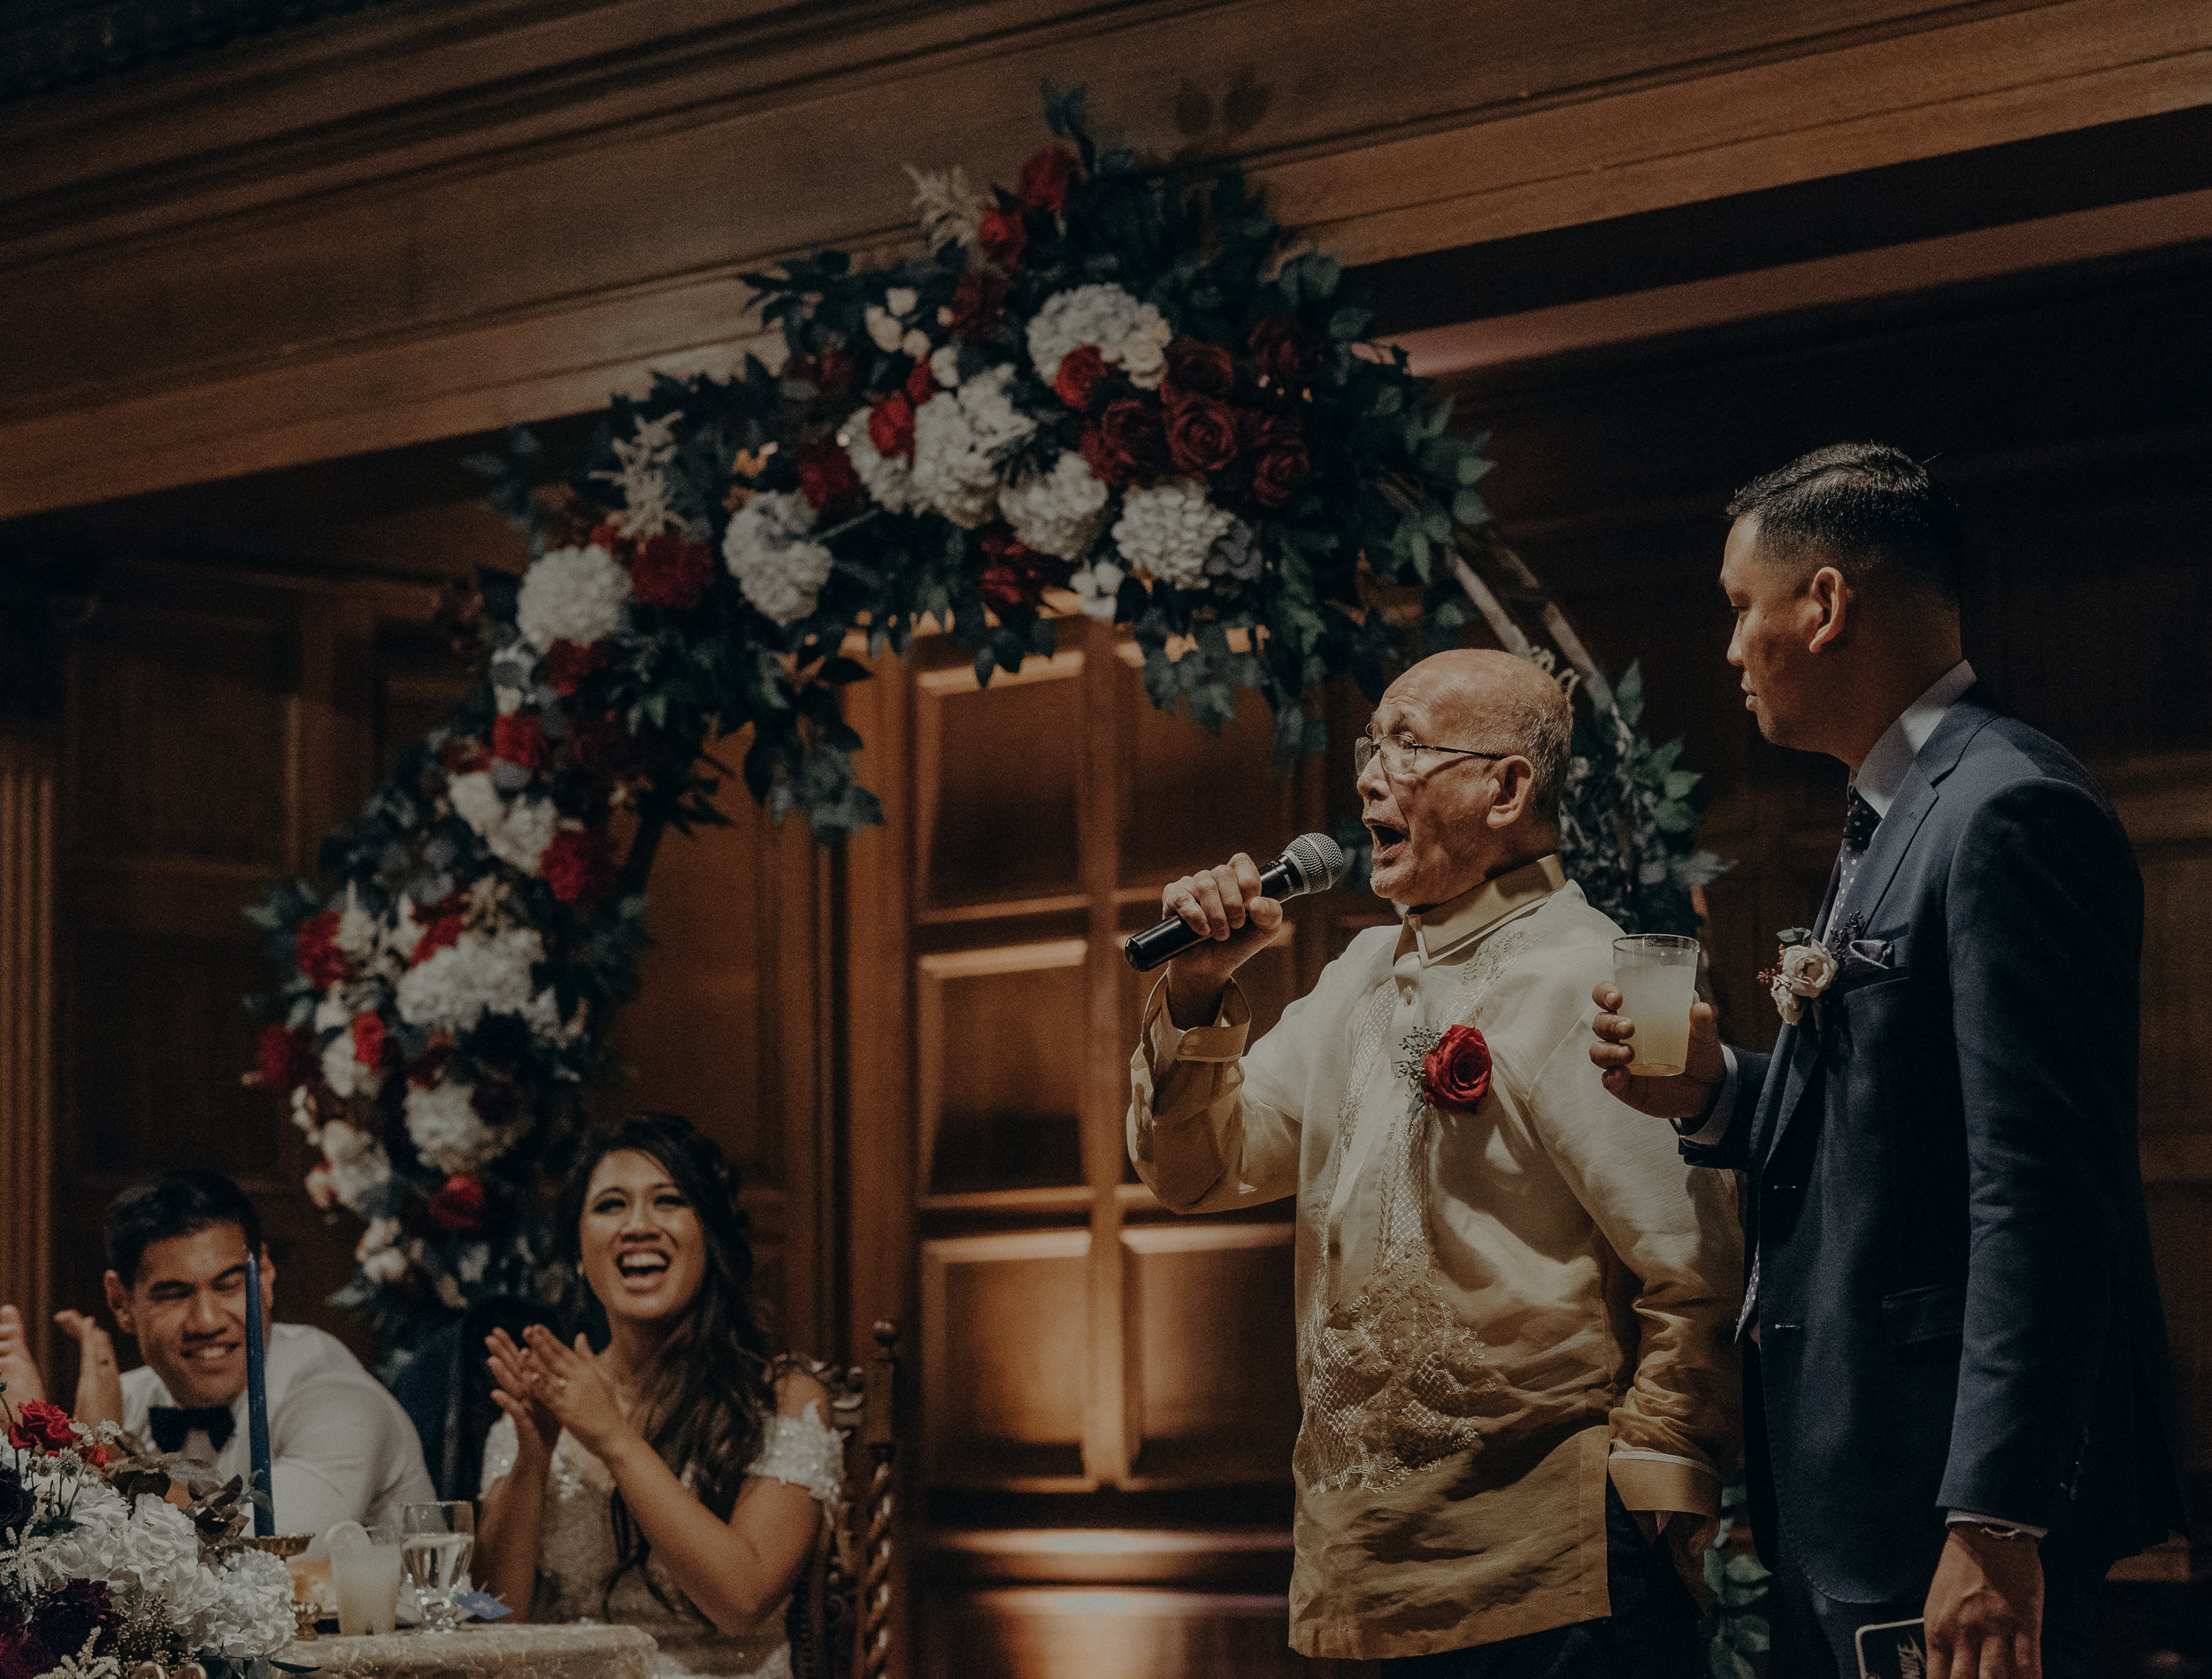 ©Isaiah + Taylor Photography - the Loft on Pine Wedding, Long Beach Wedding Photographer-074.jpg